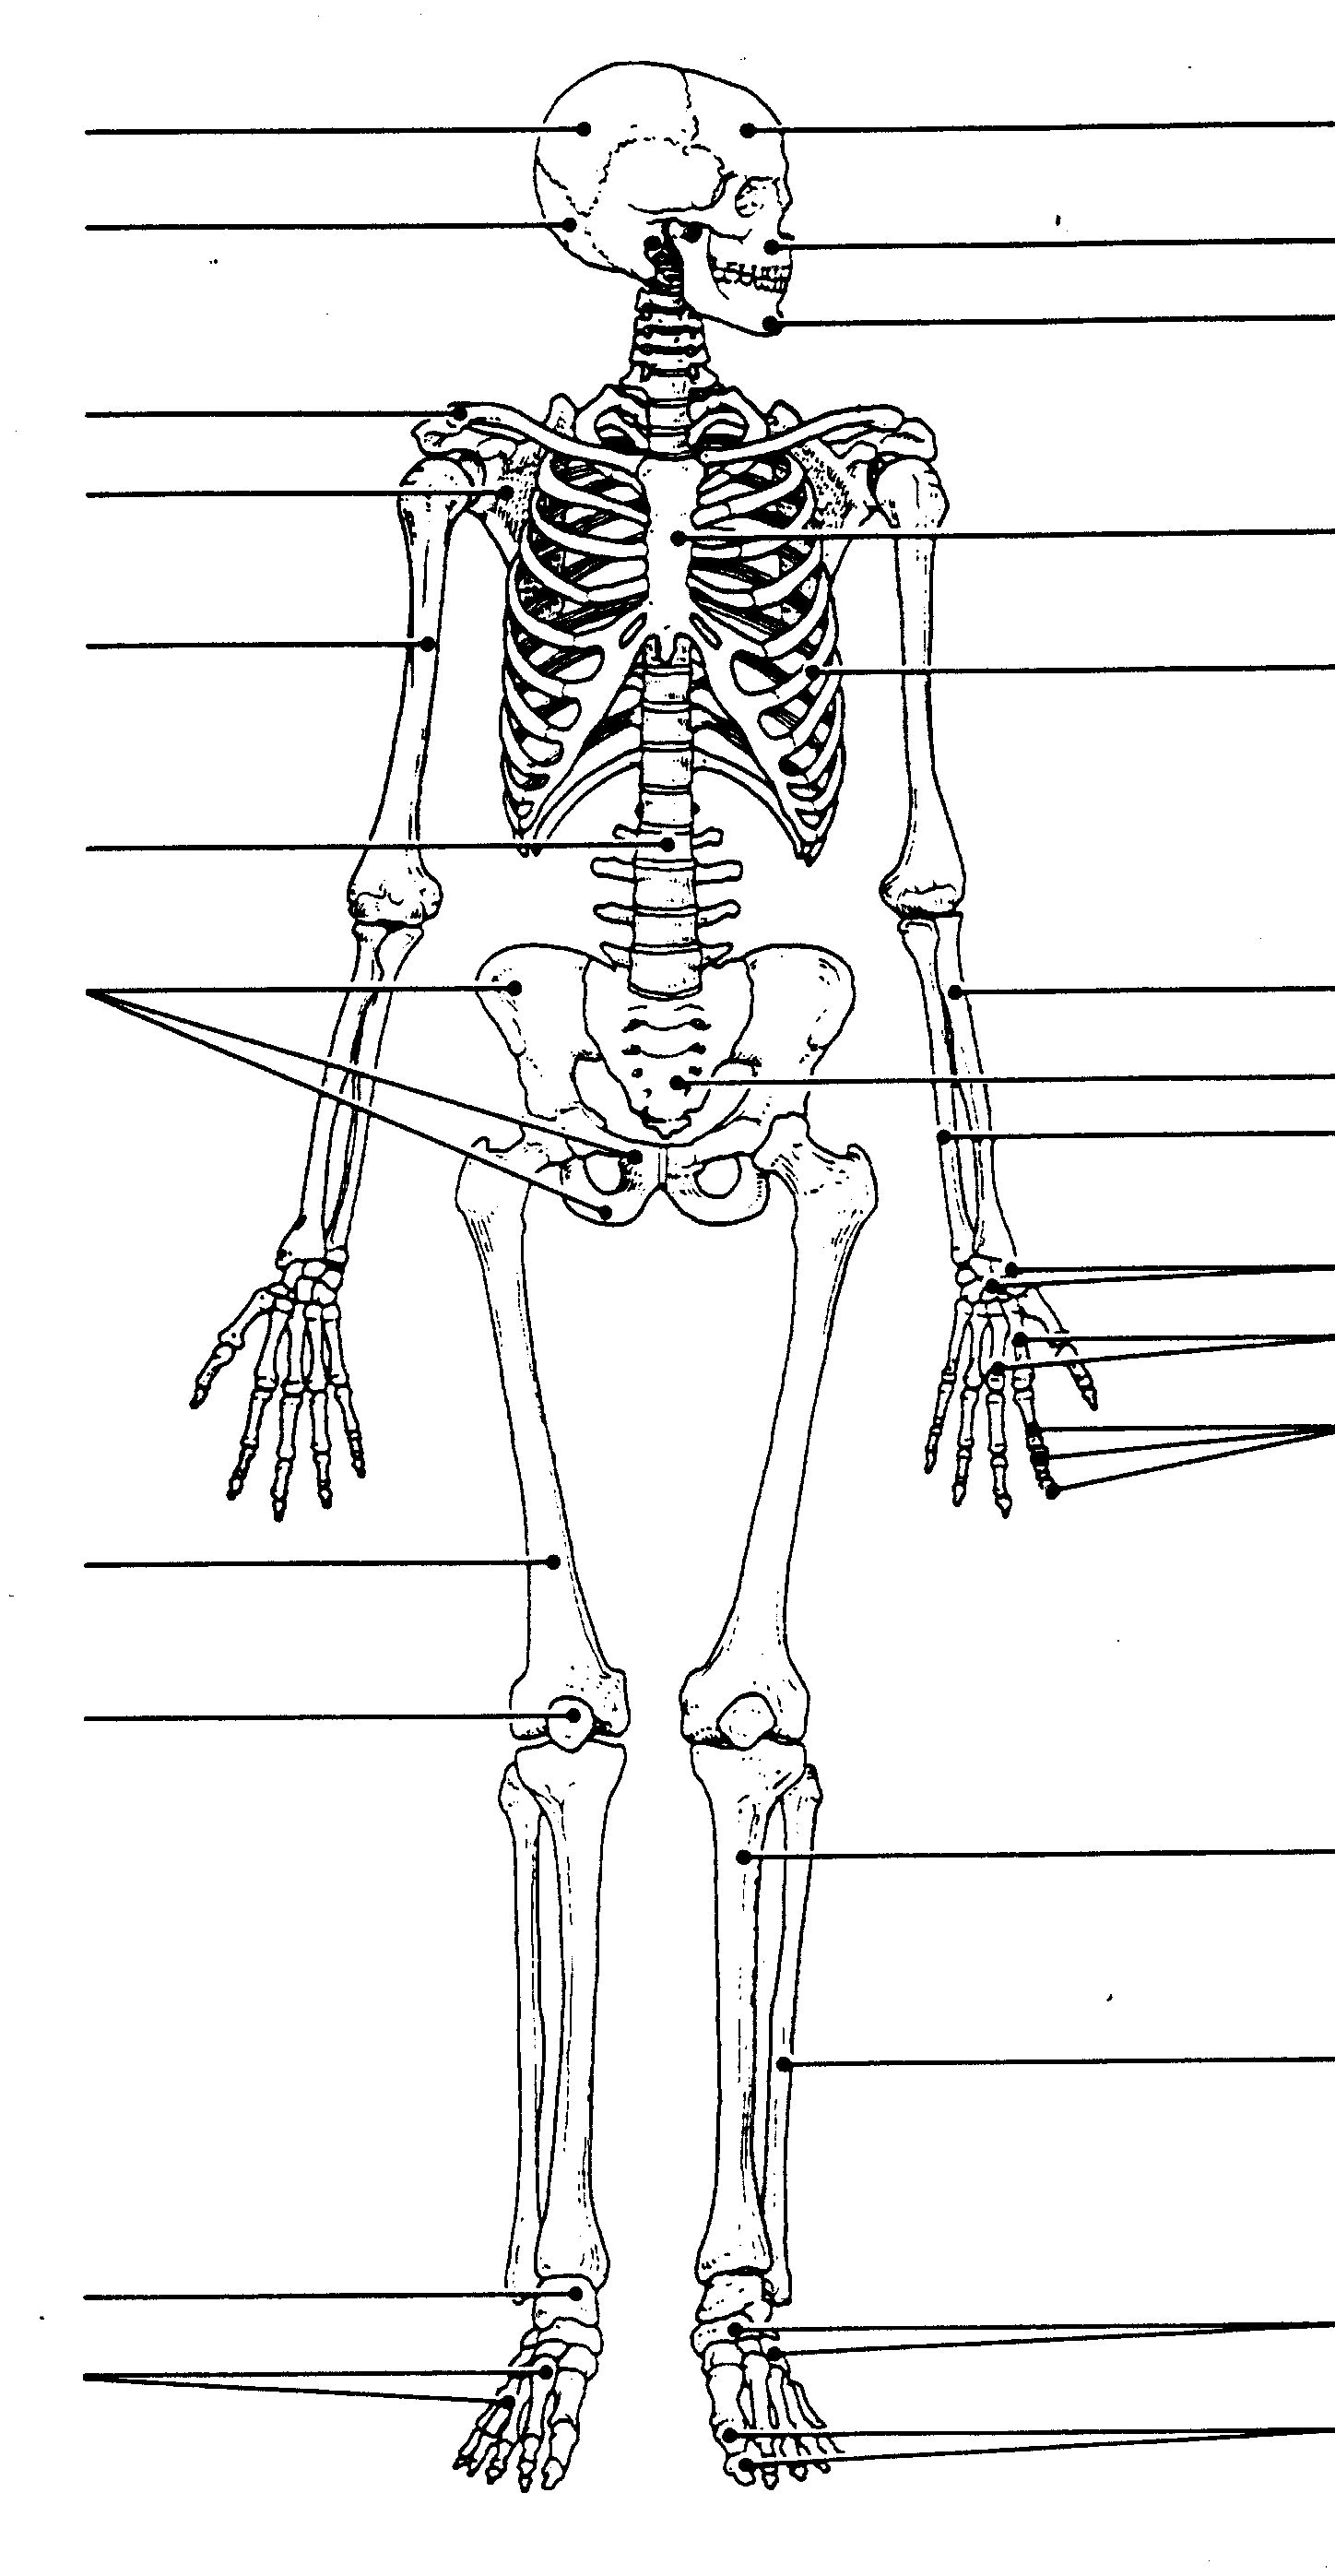 hight resolution of unlabeled human skeleton diagram unlabeled human skeleton diagram blank human skeleton diagram unlabeled human skeleton